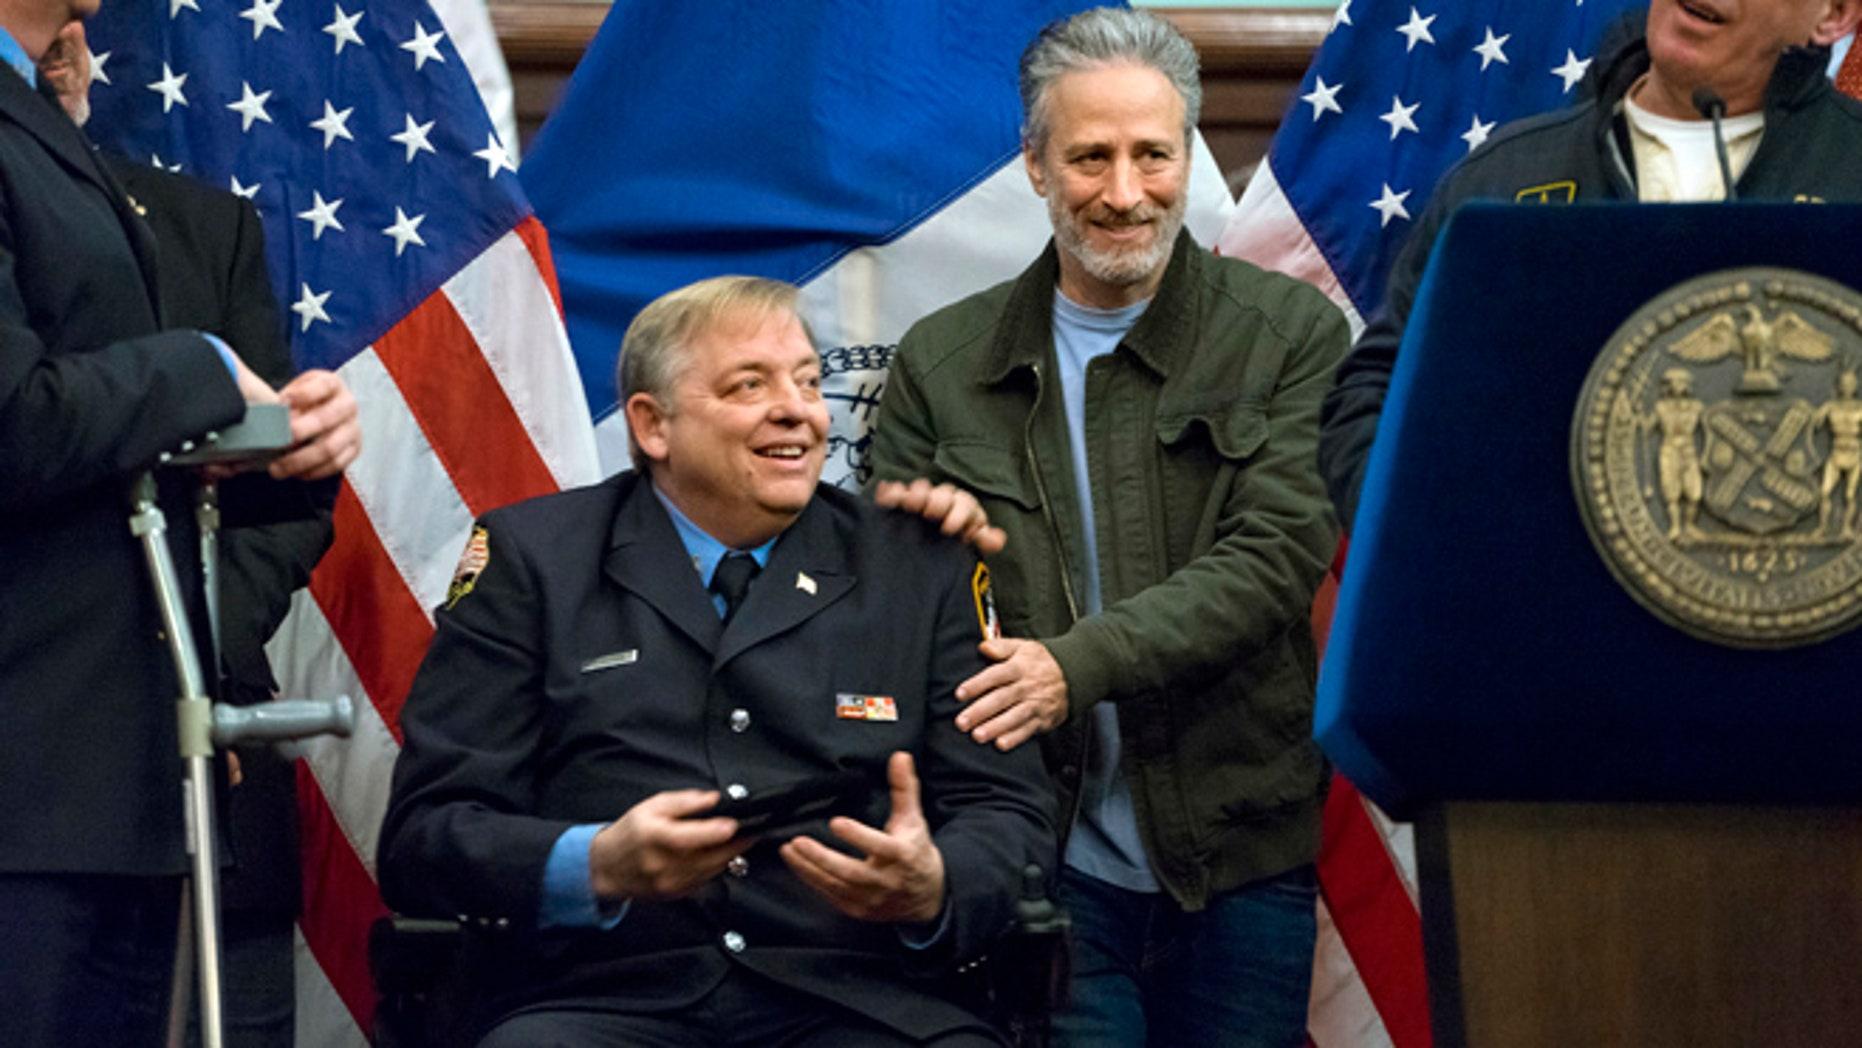 Jon Stewart and retired firefighter Ray Pfeifer in 2016. Stewart spoke at Pfeifer's funeral.